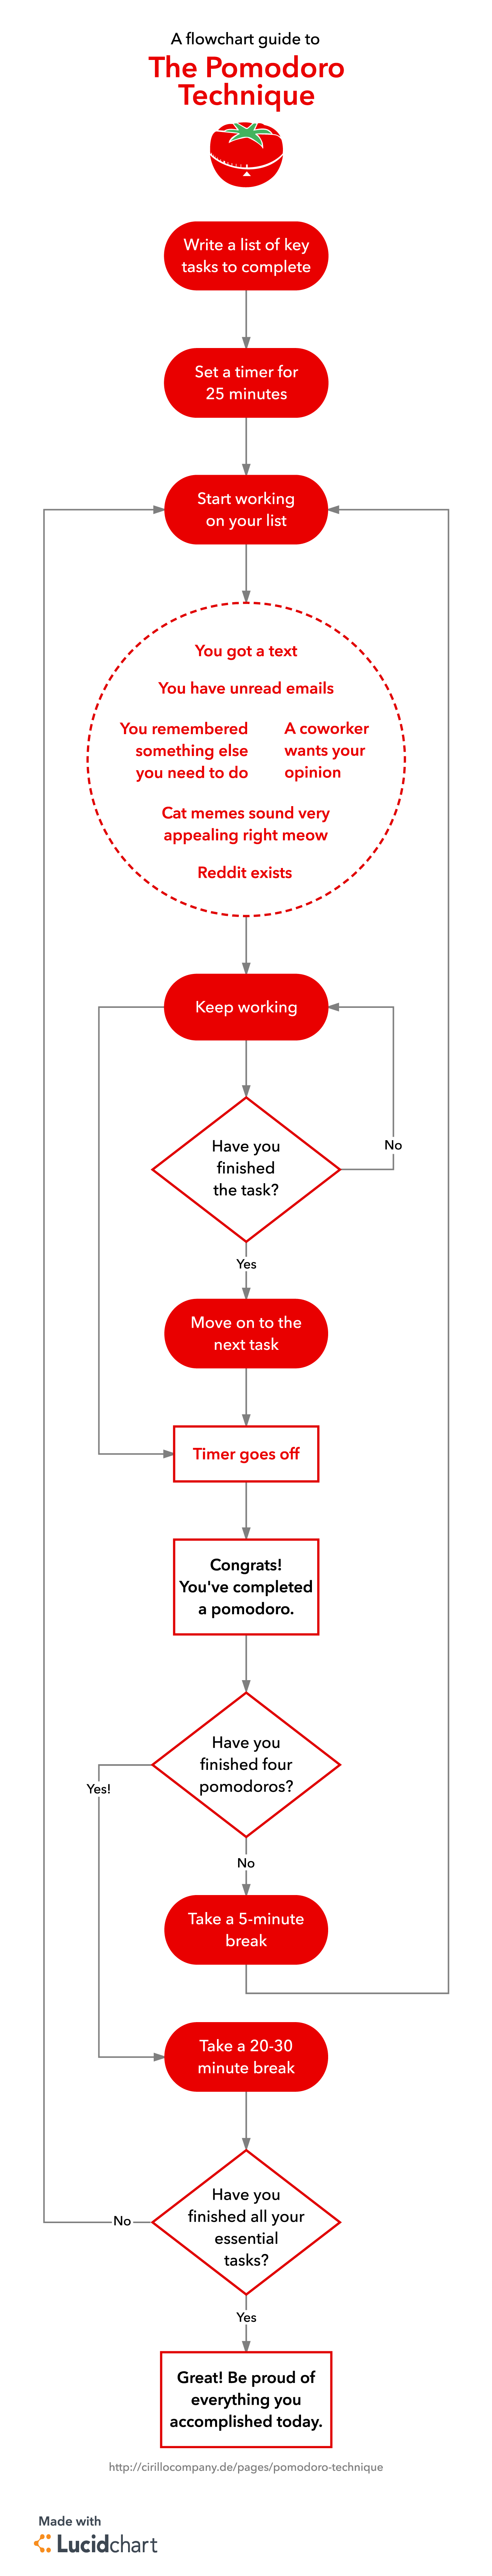 pomodoro technique pdf flowchart